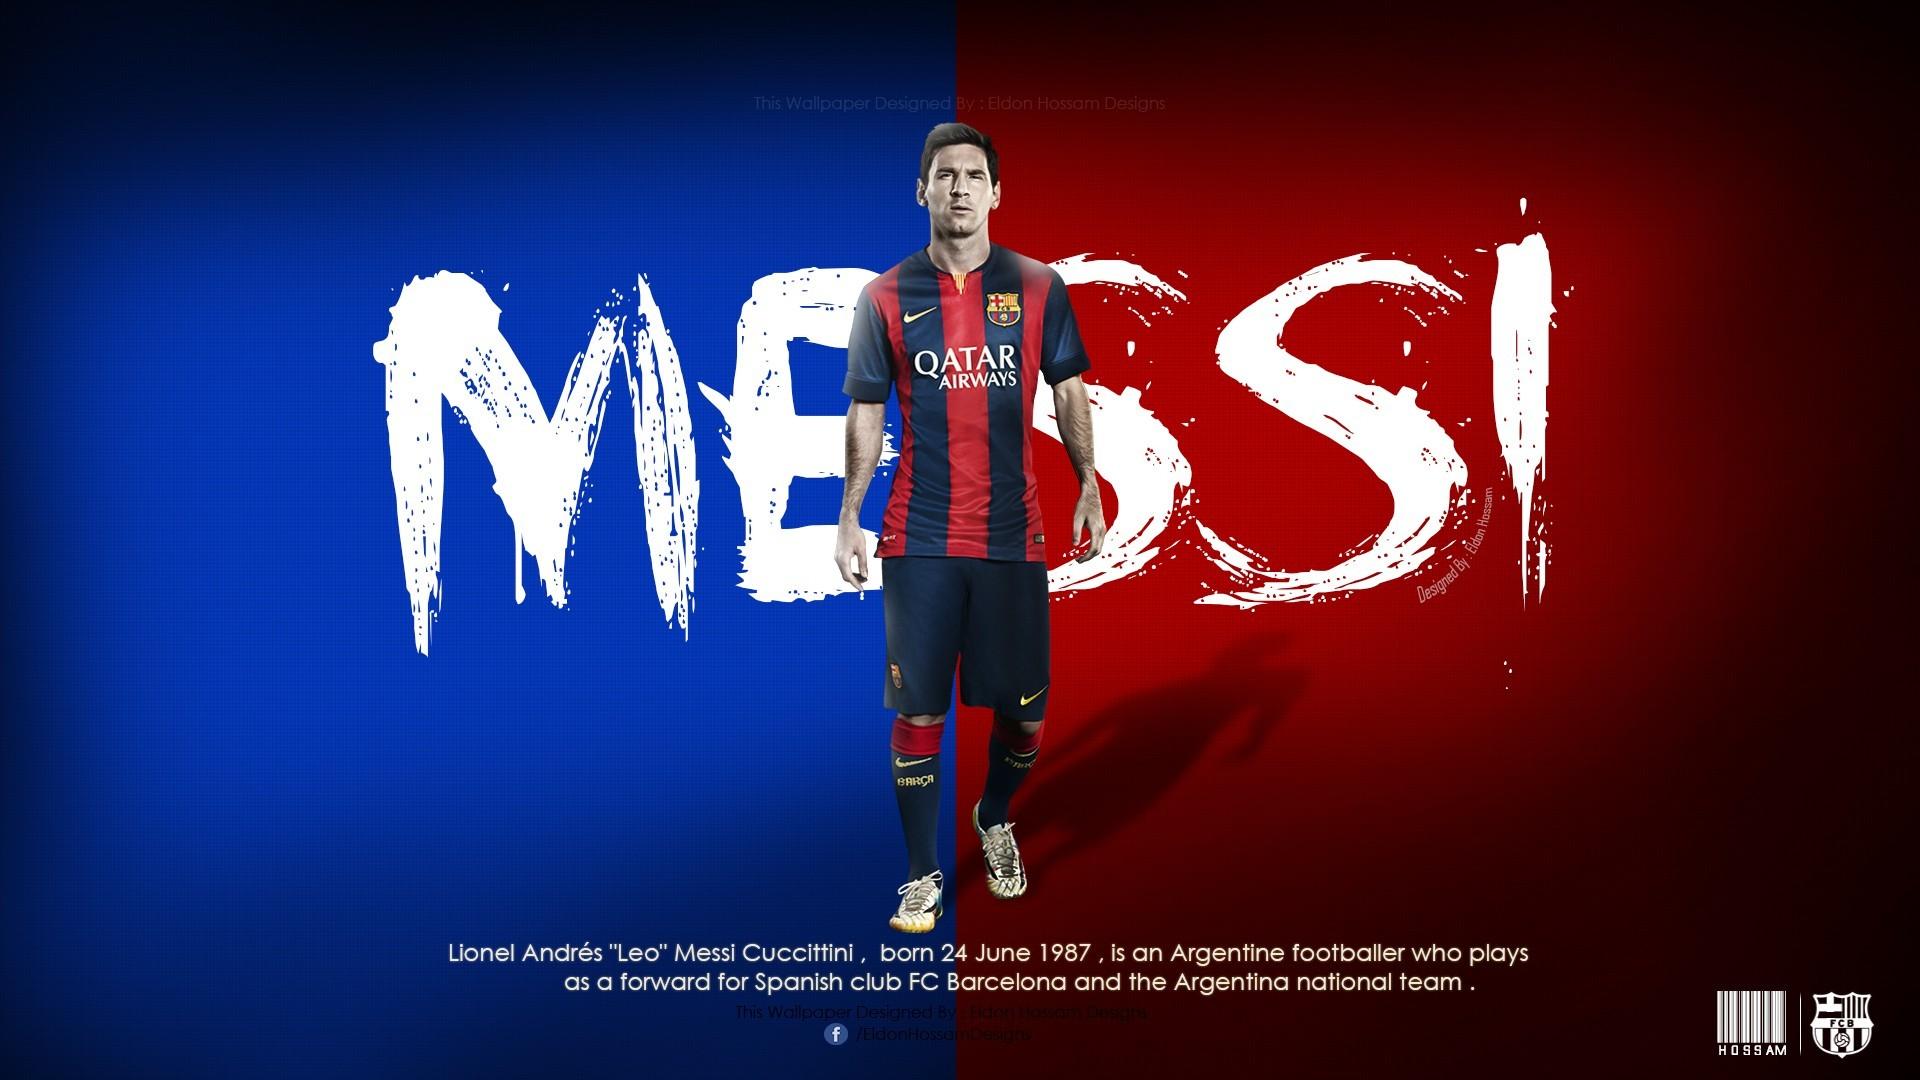 Beautiful Lionel Messi Vs Neymar Wallpaper – FC Barcelona Wallpaper HD 2017  JDY7